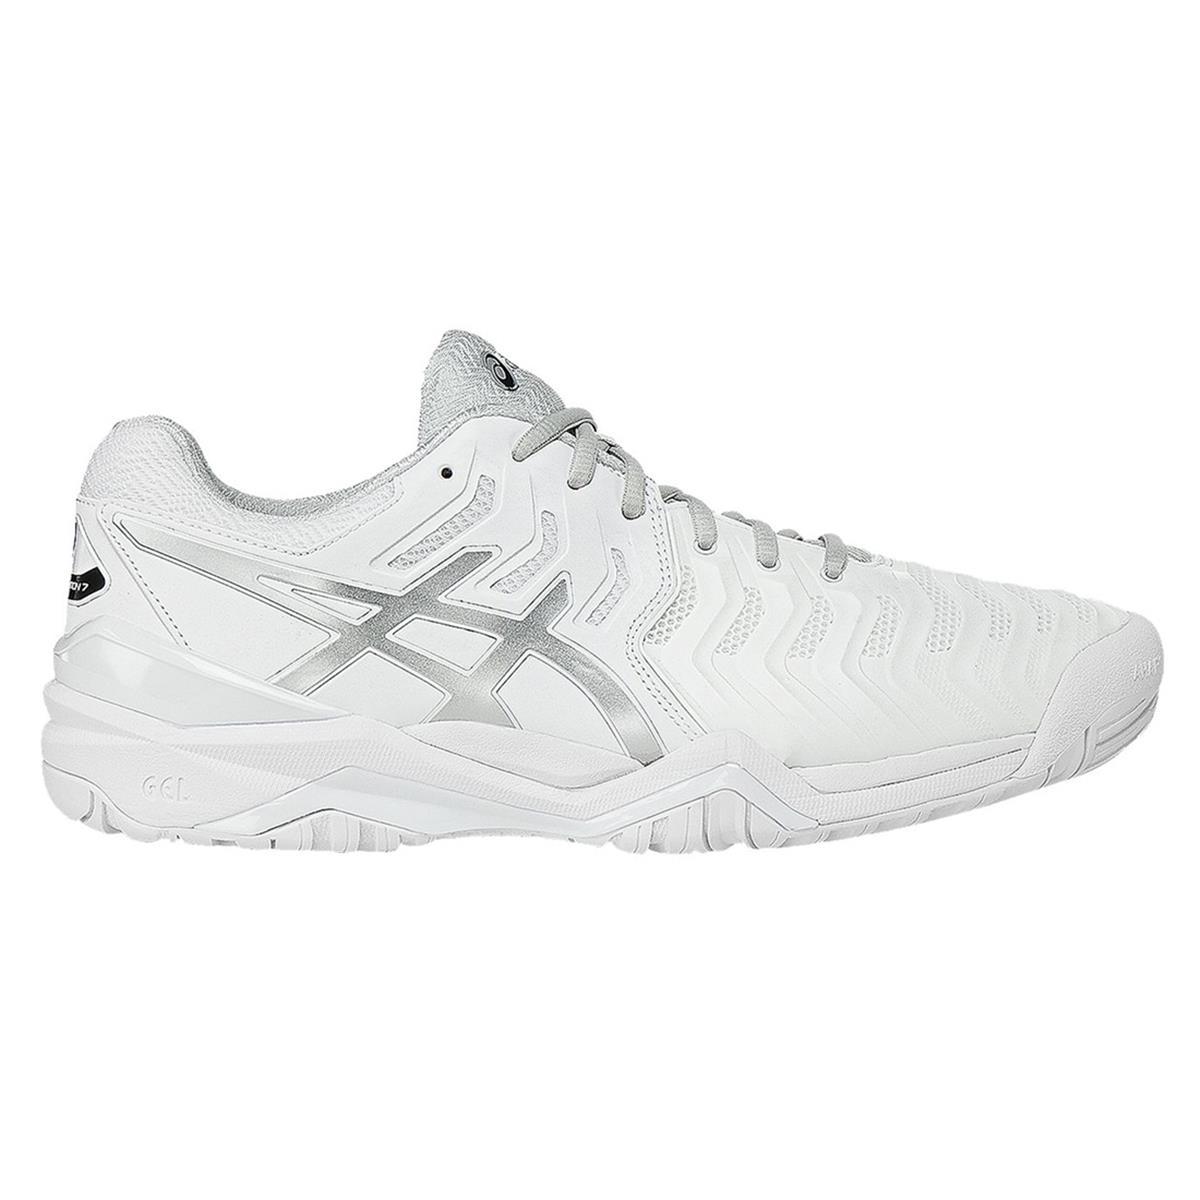 Asics Gel Resolution 7 Mens Tennis Shoes (White-Silver) | Direct Tennis